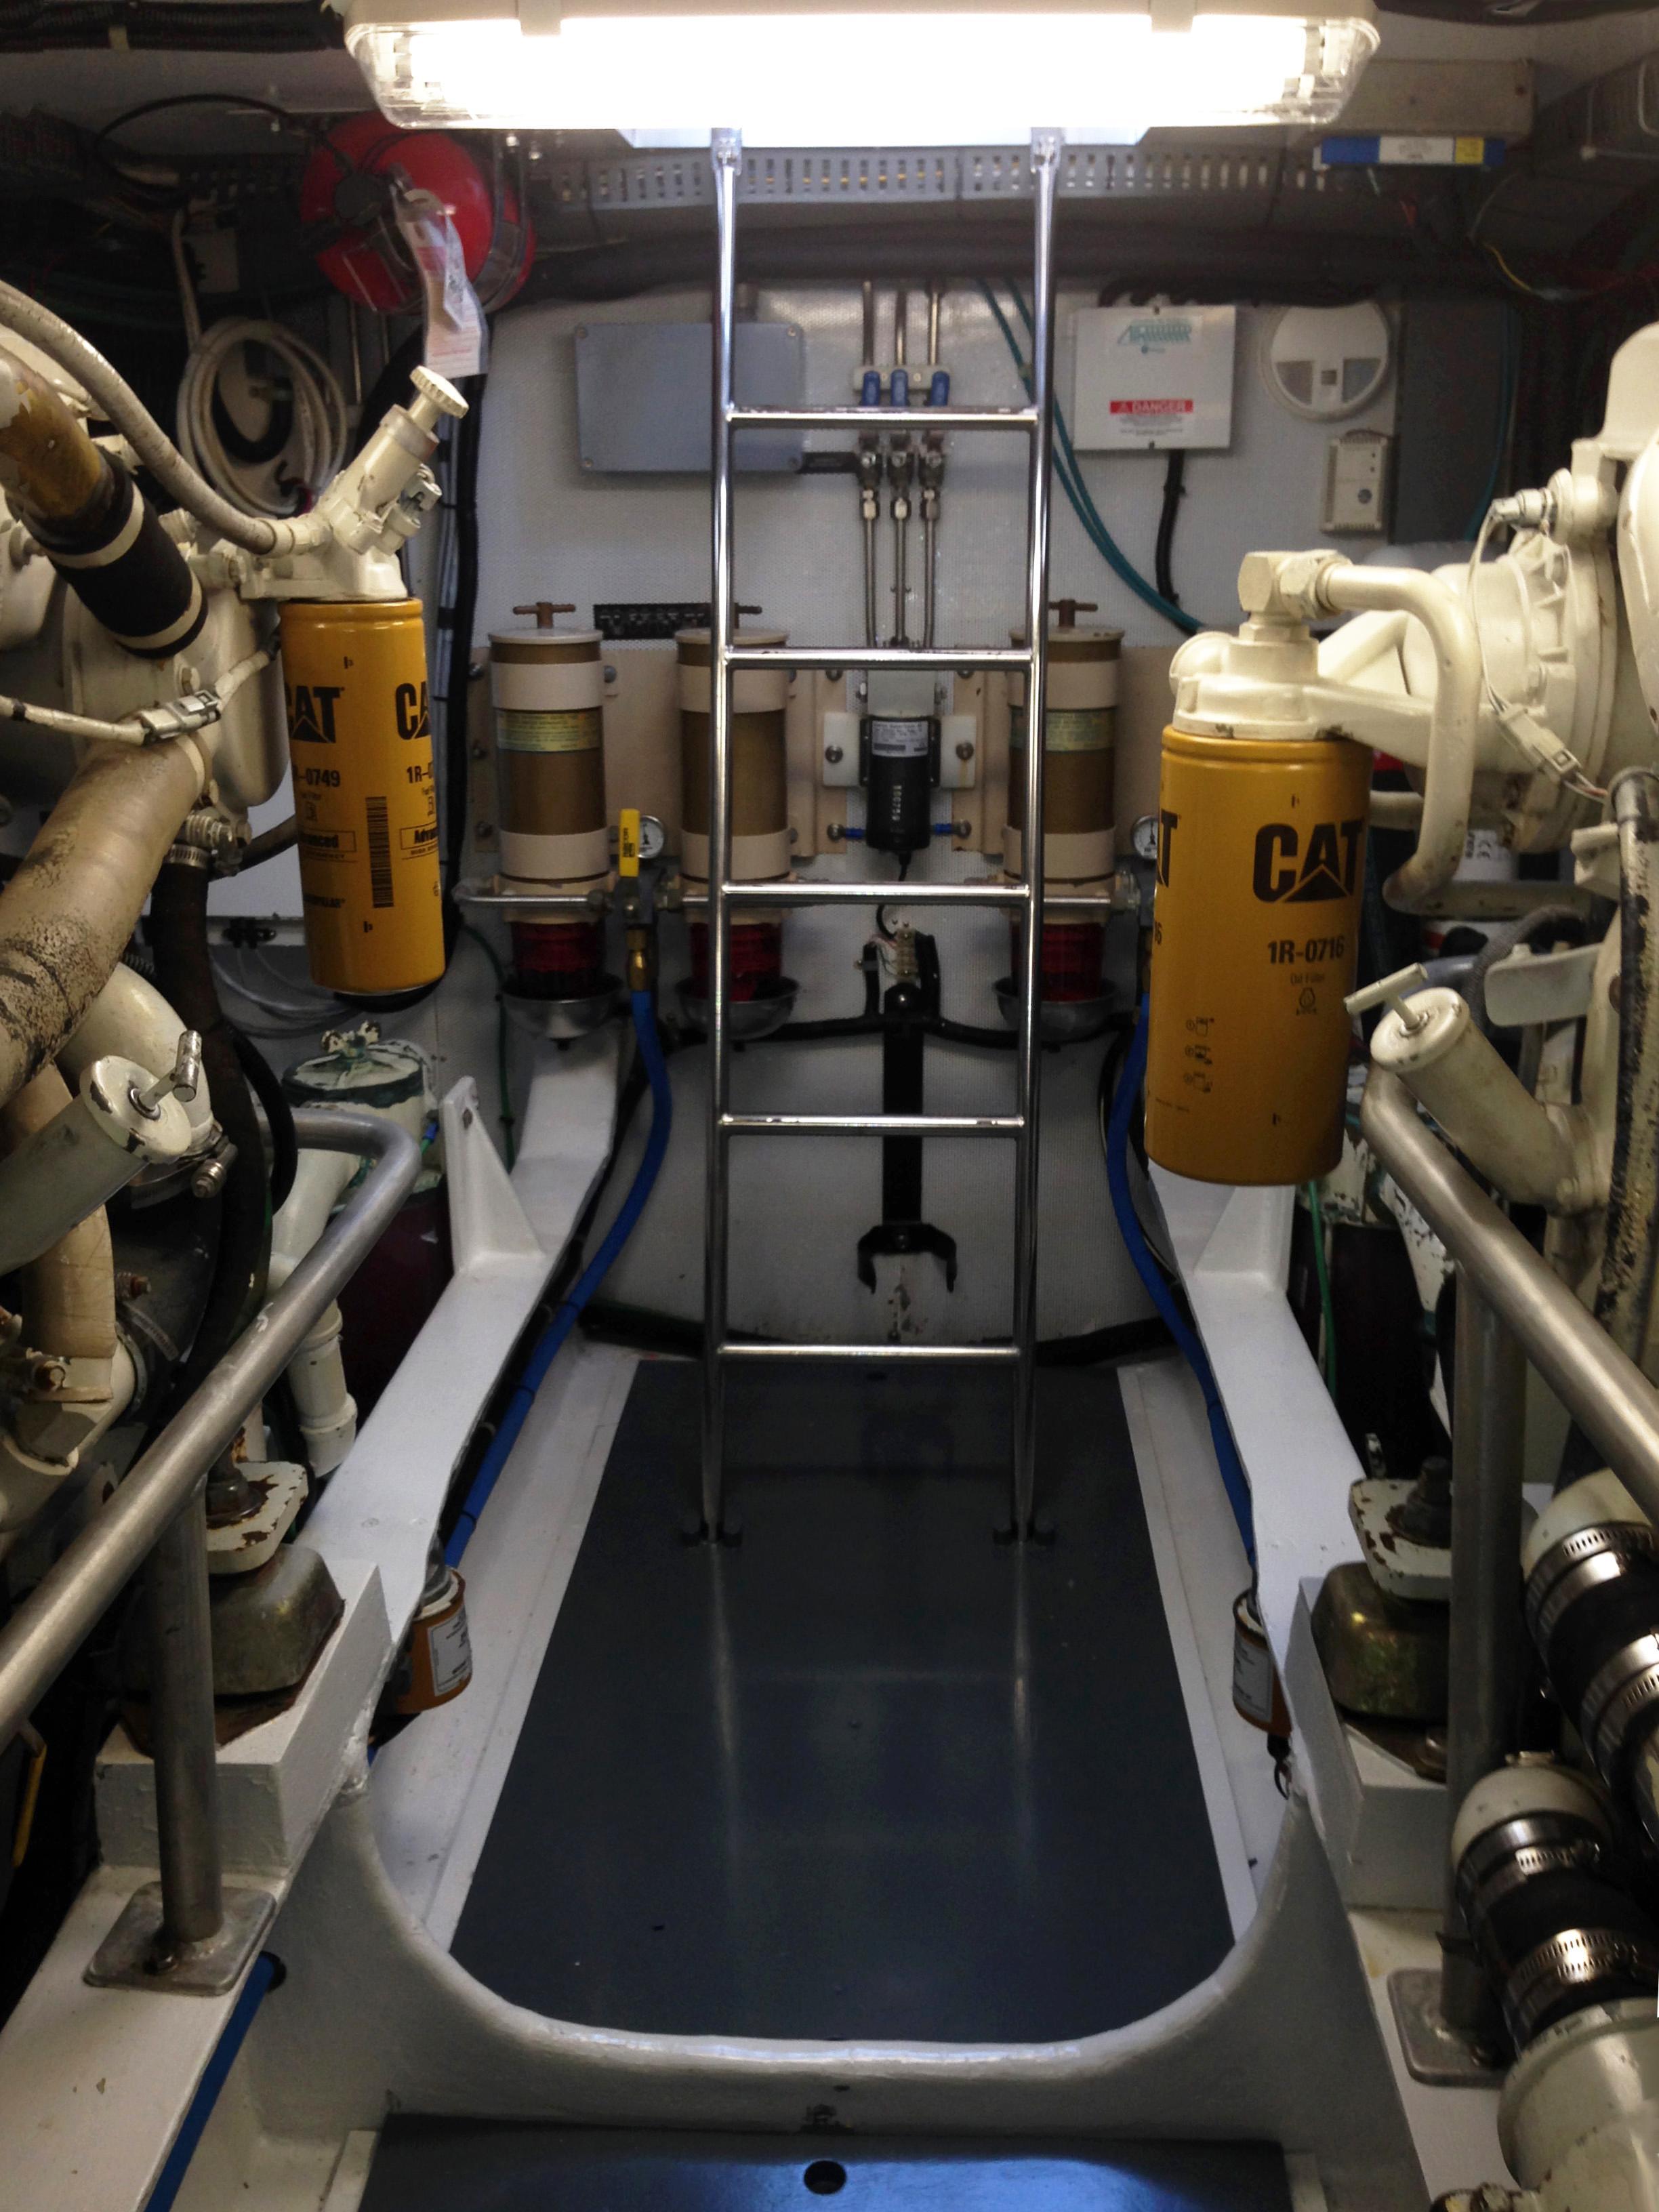 Engine Room Access, New Lighting